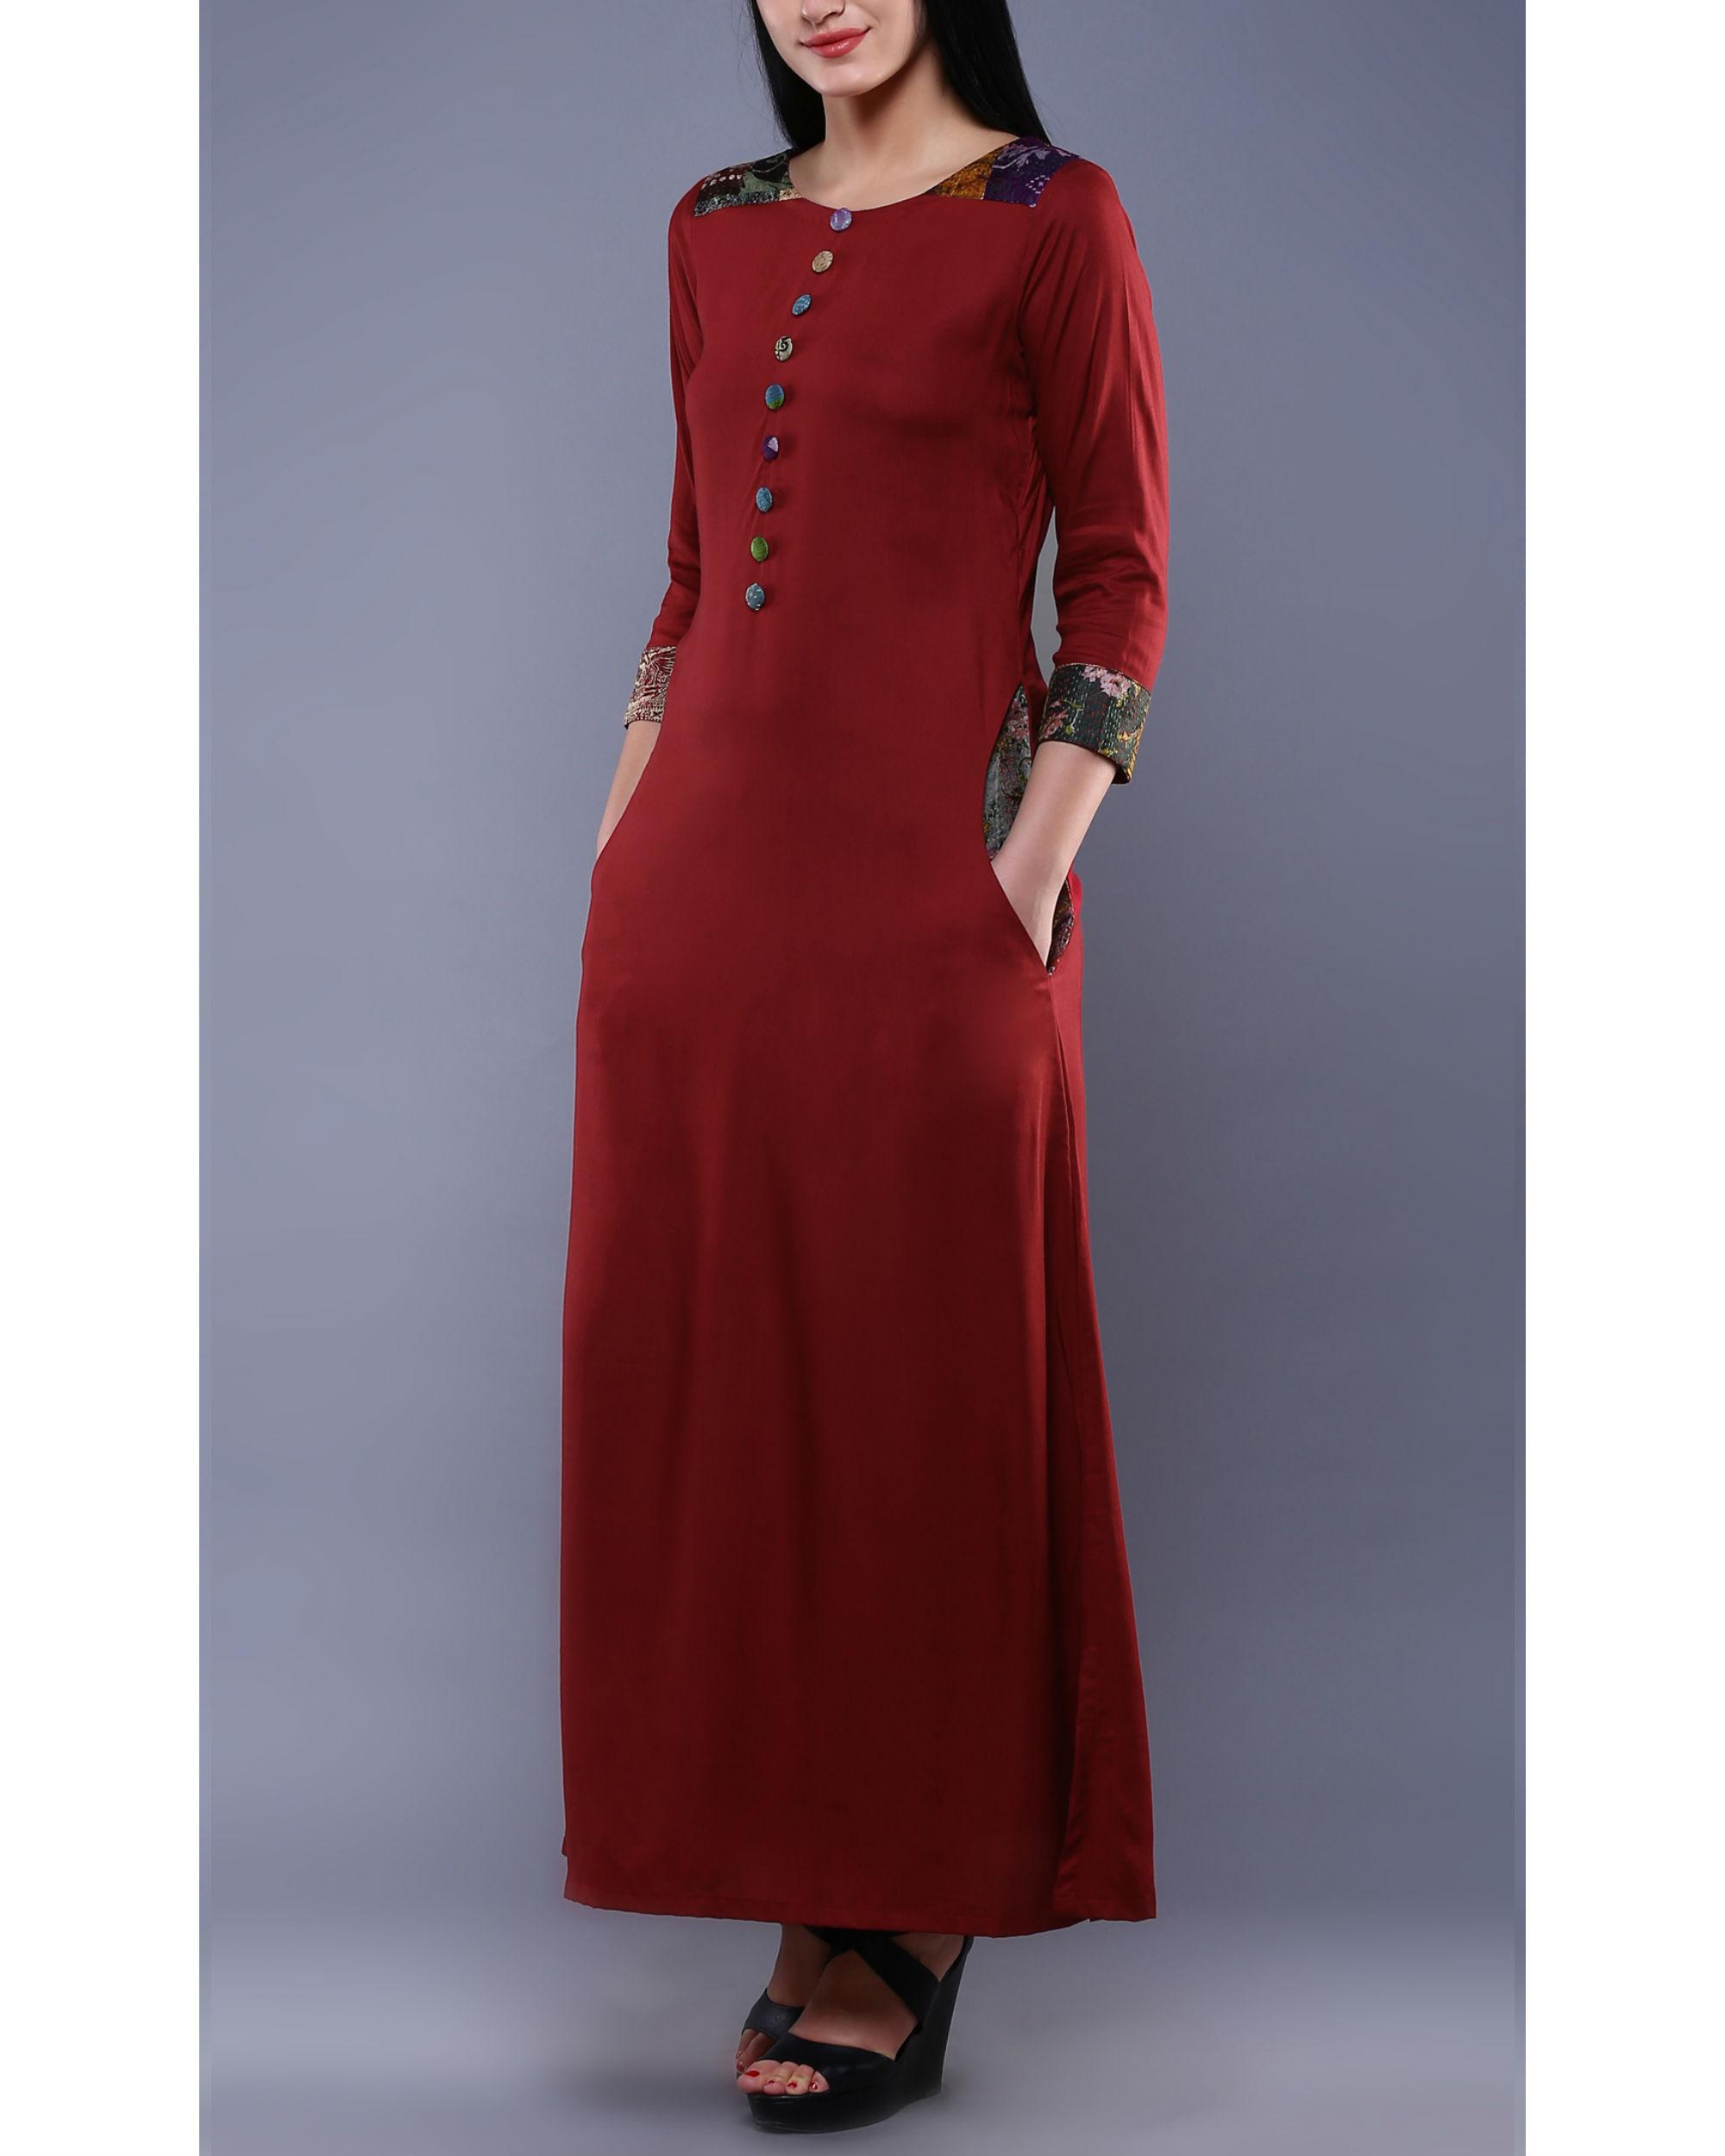 Maroon kantha dress